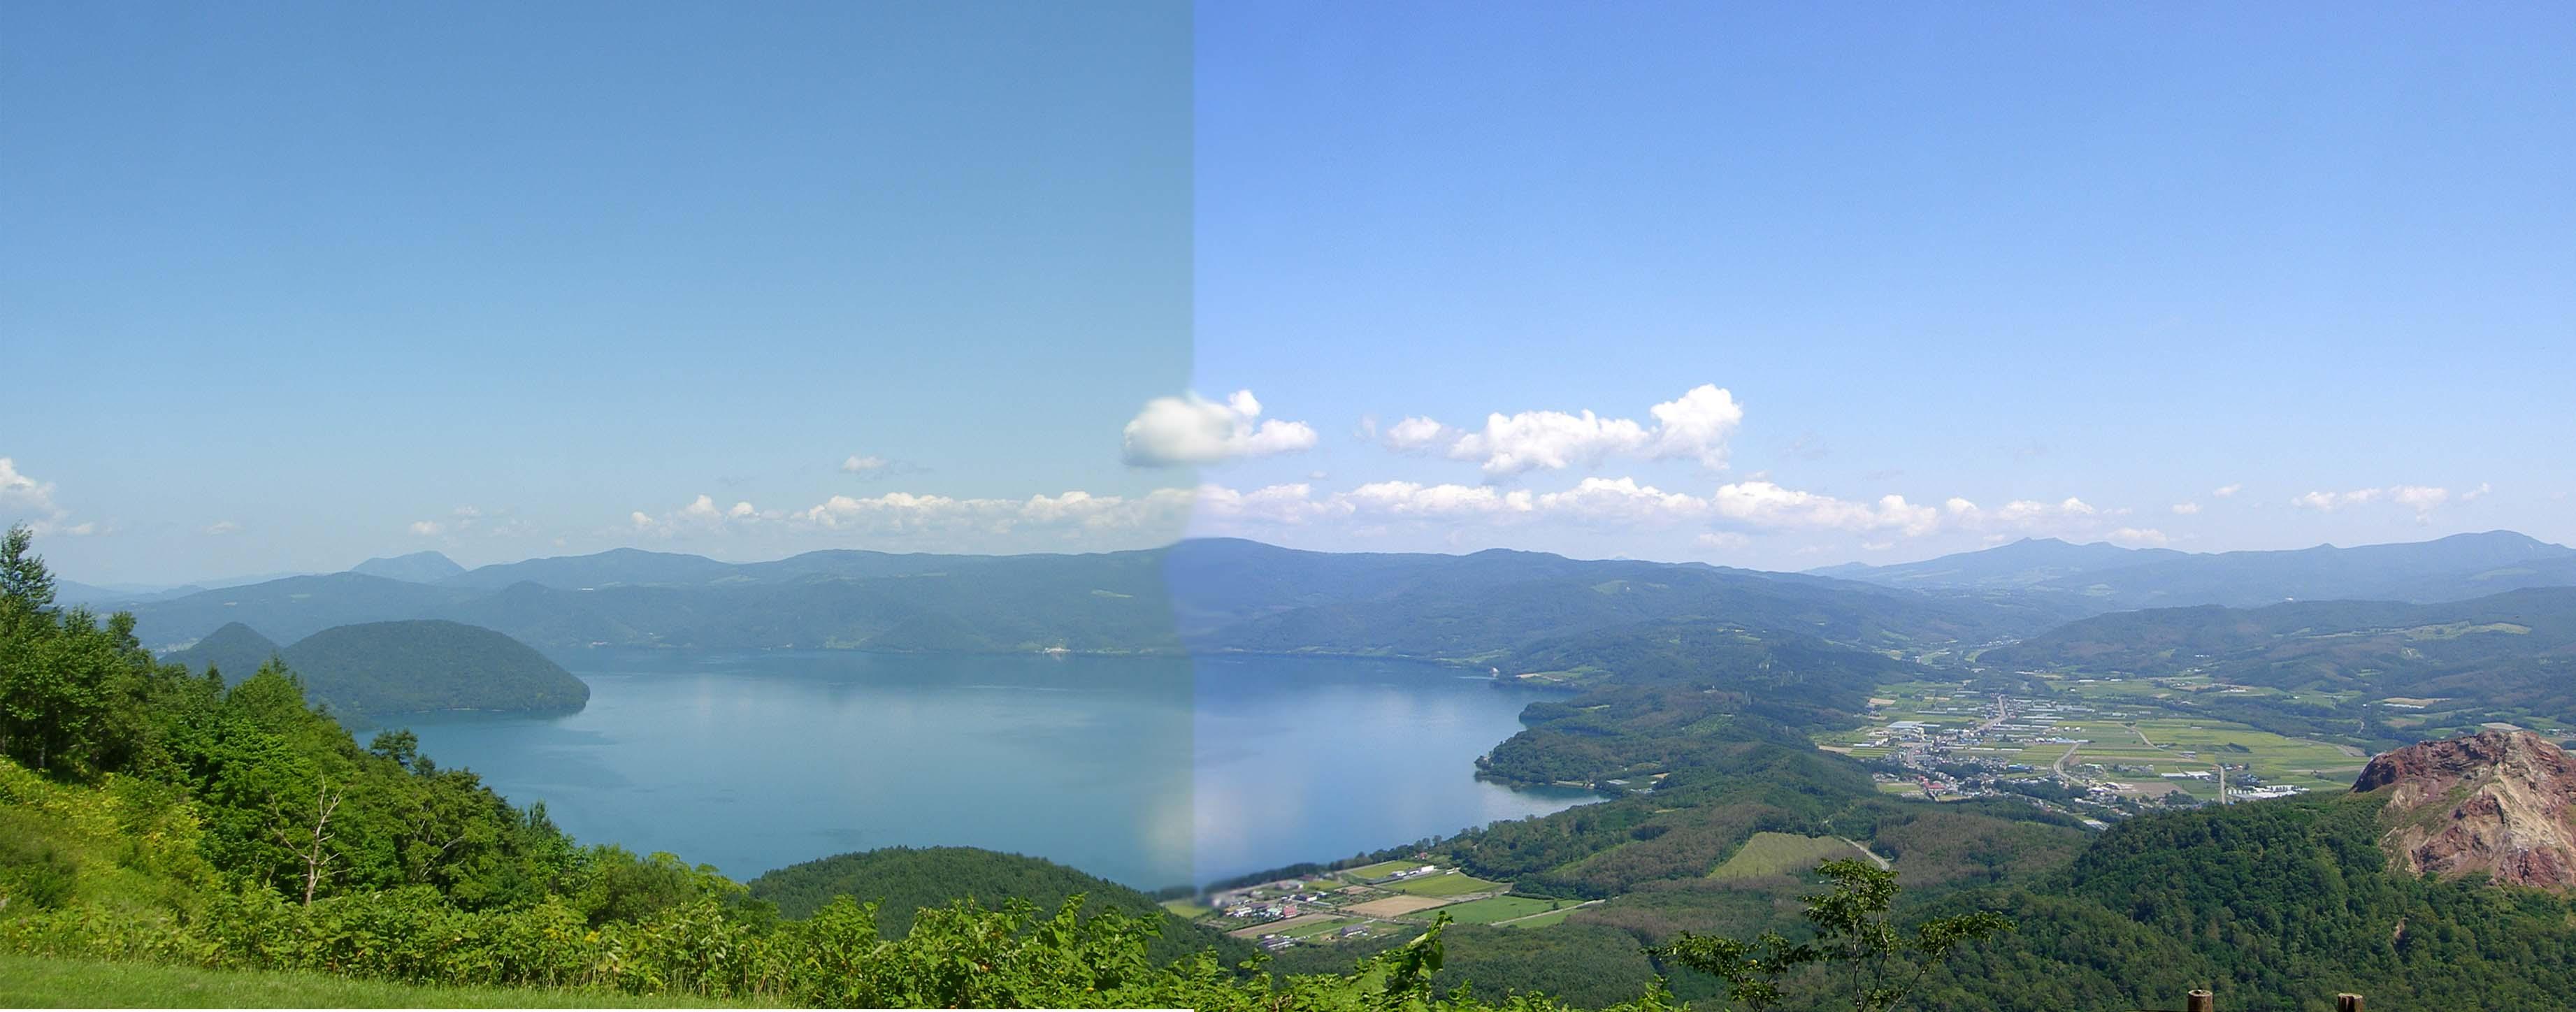 B 洞爺湖 有珠山から